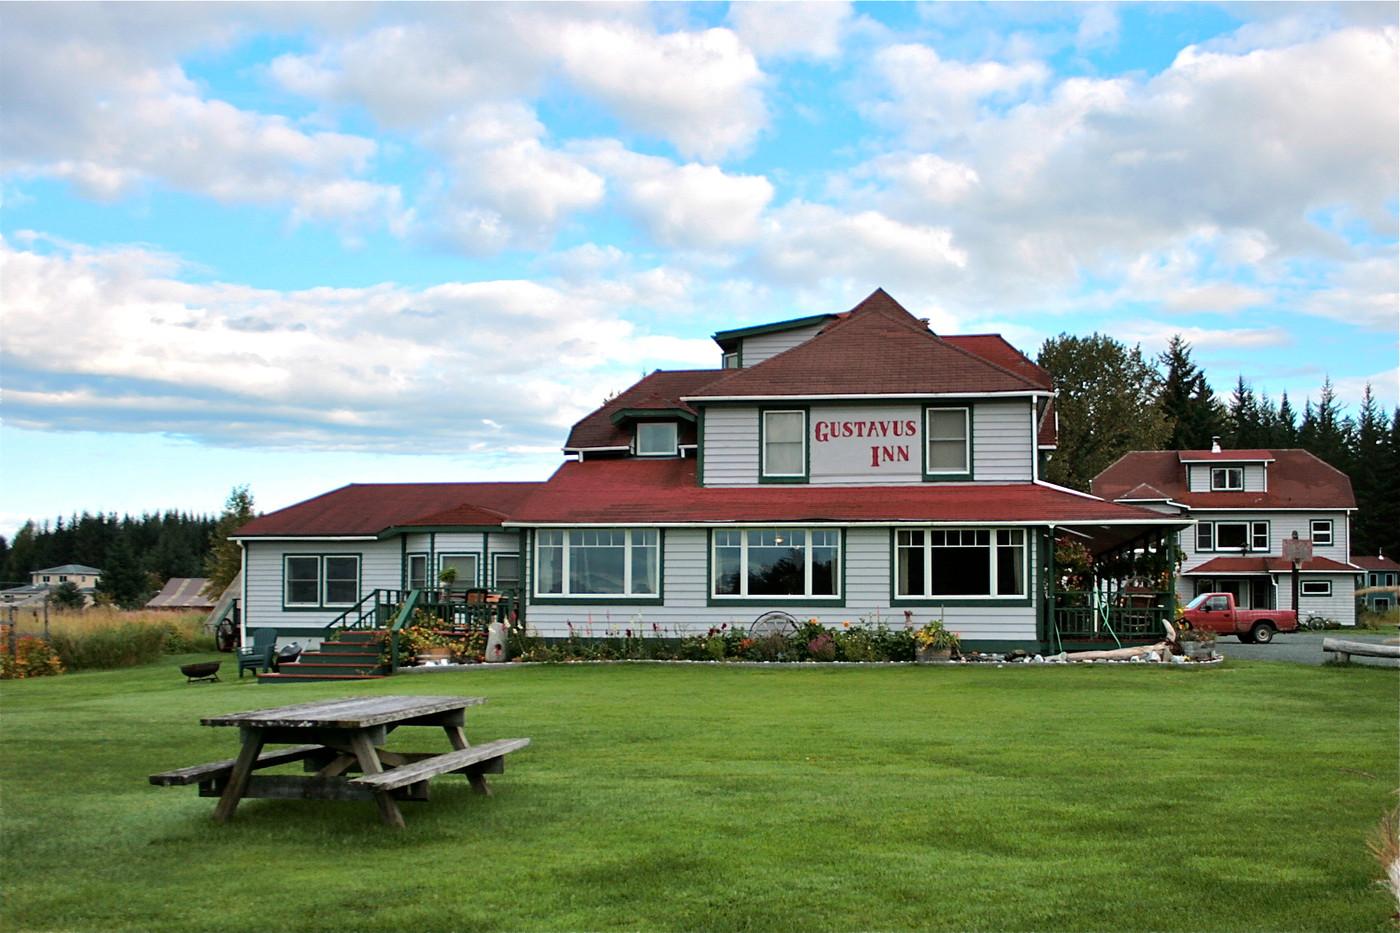 Gustavus Inn from the lawn